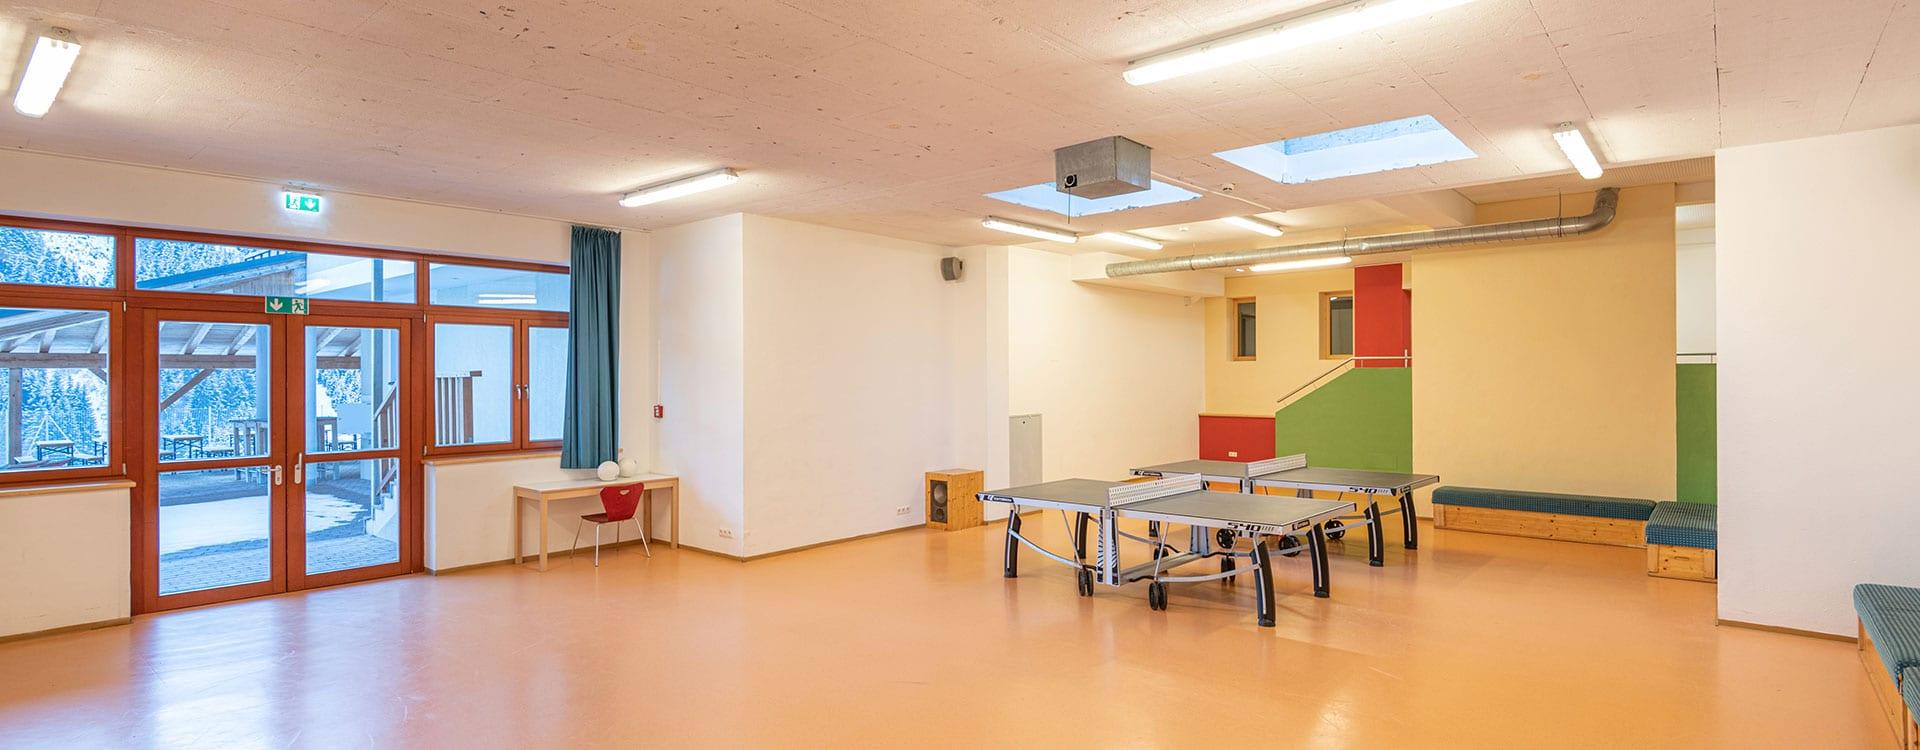 Multifunktionshalle im Jugendhotel Saringgut, Wagrain, Salzburg